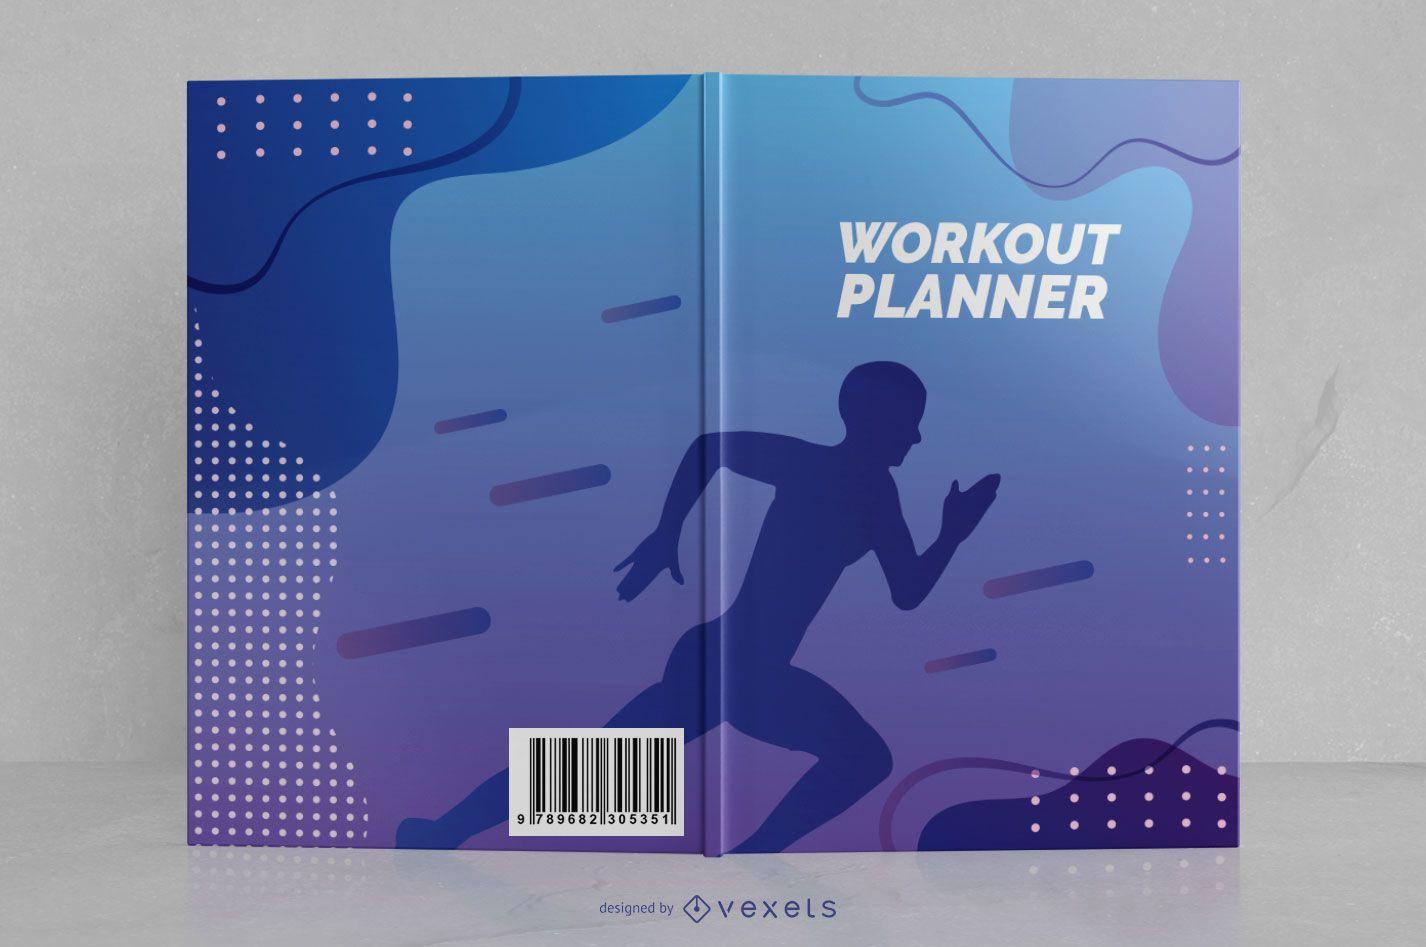 Workout planner runner book cover design